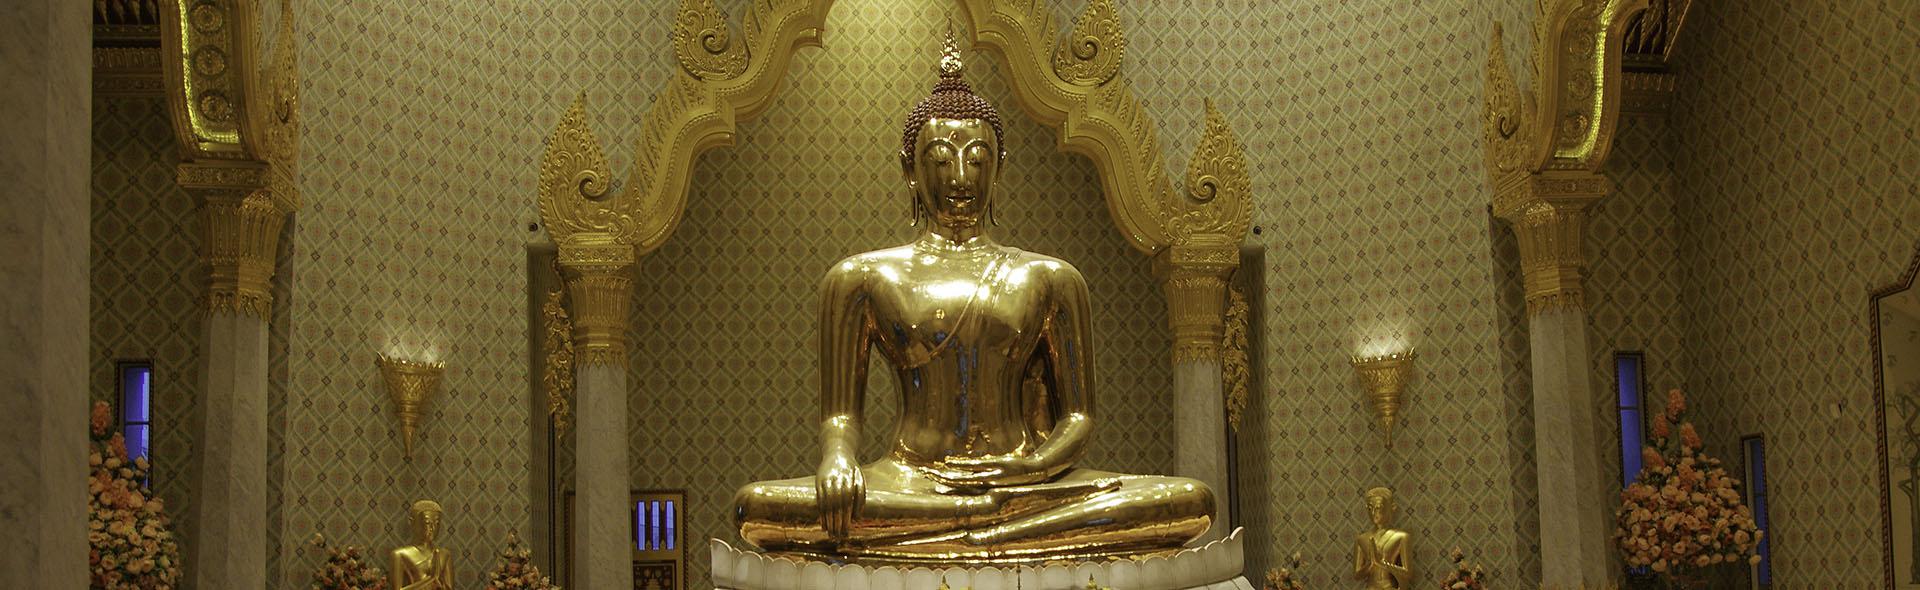 Der Gipsbuddha